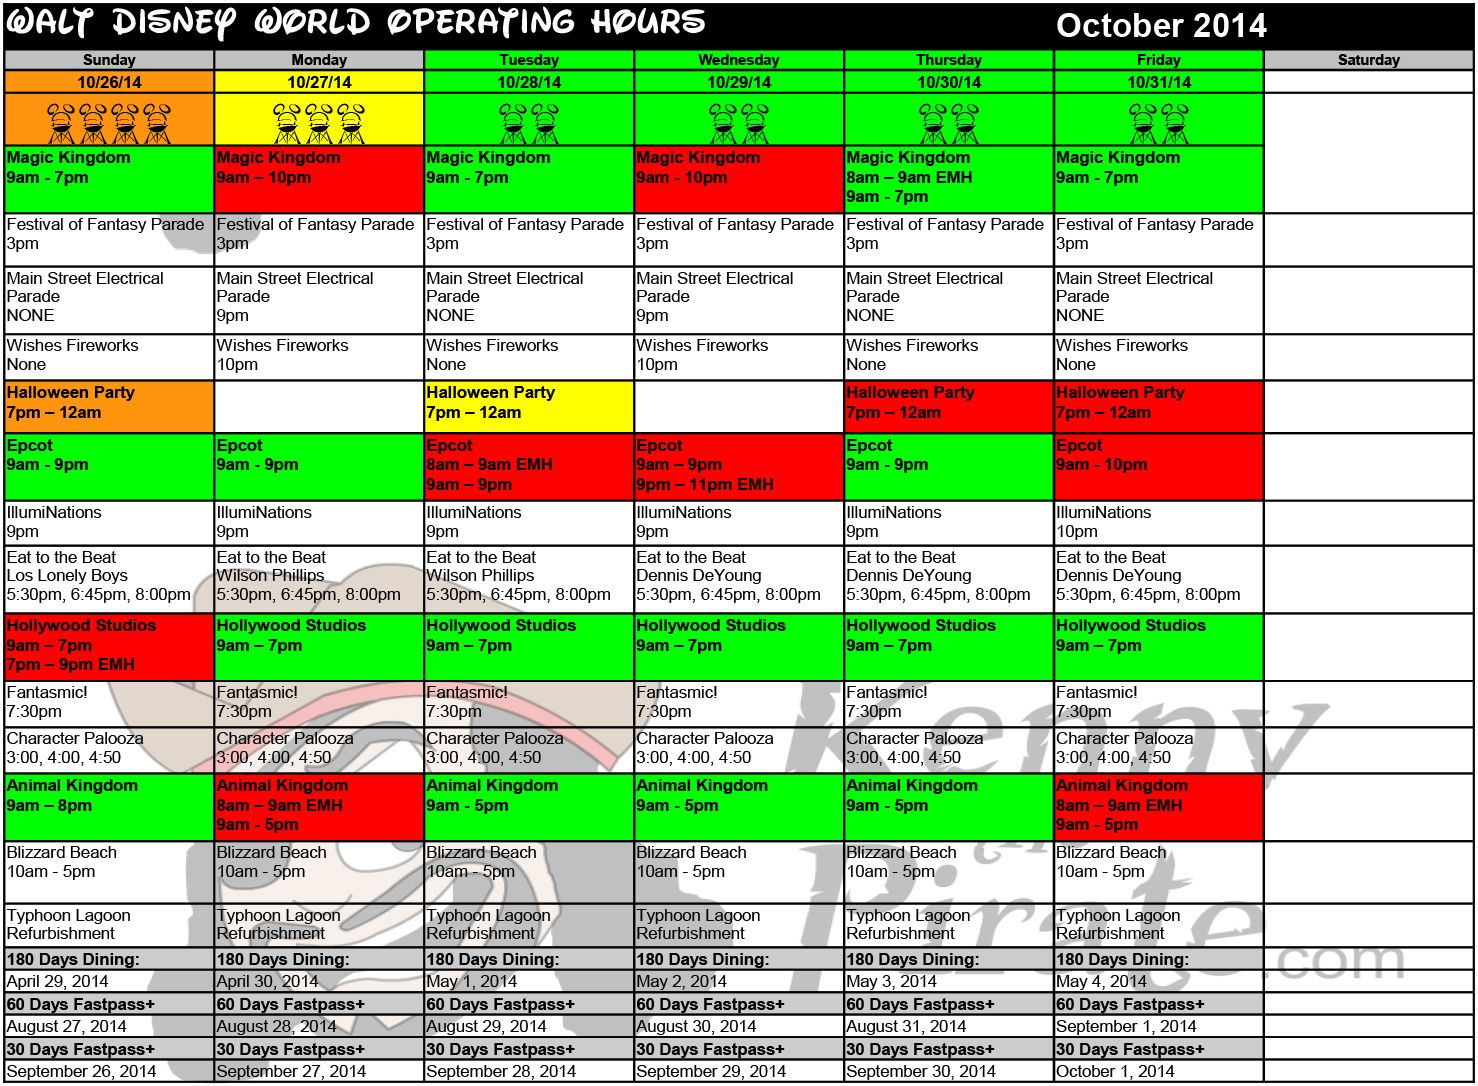 Disney World Crowd Calendar October 2020 l KennythePirate